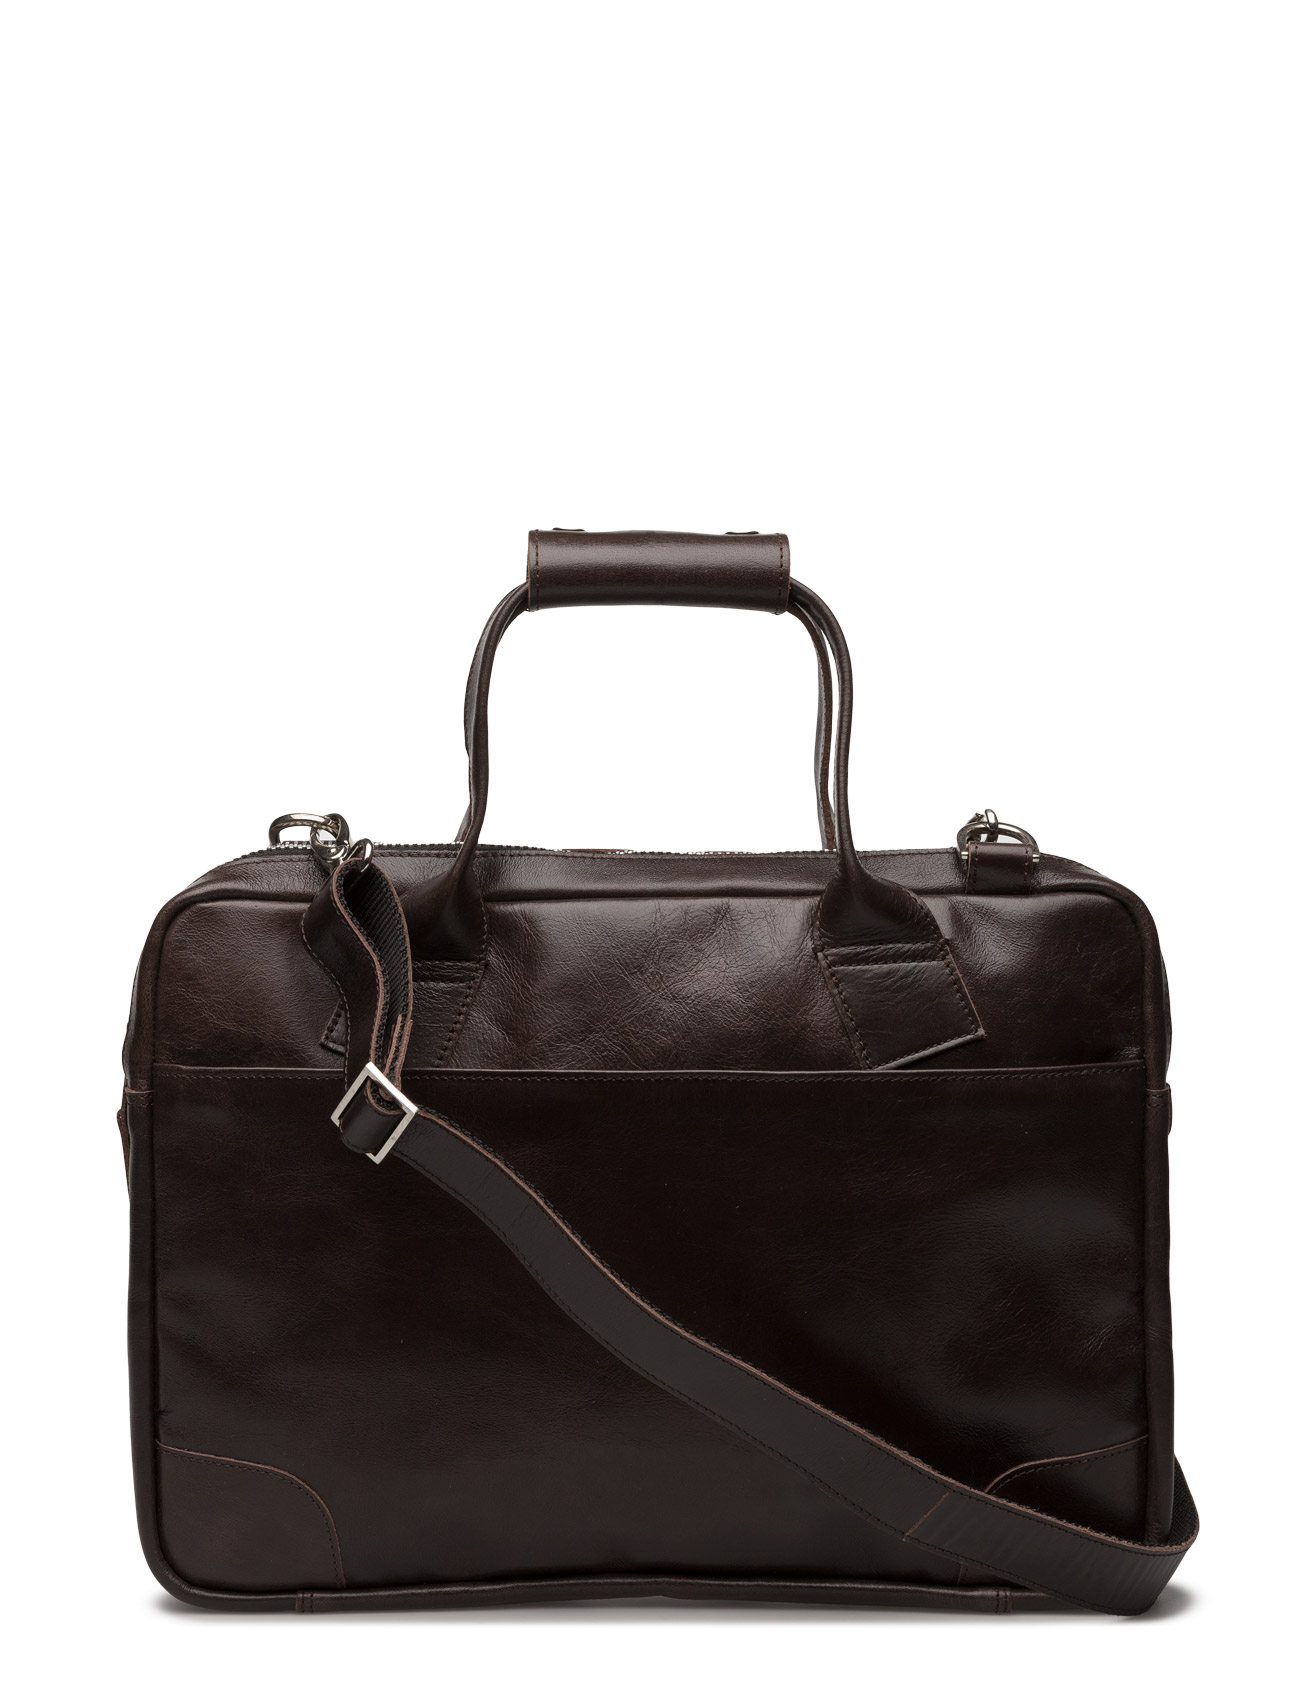 Nano Single Bag Royal RepubliQ Messenger tasker til Herrer i Brun